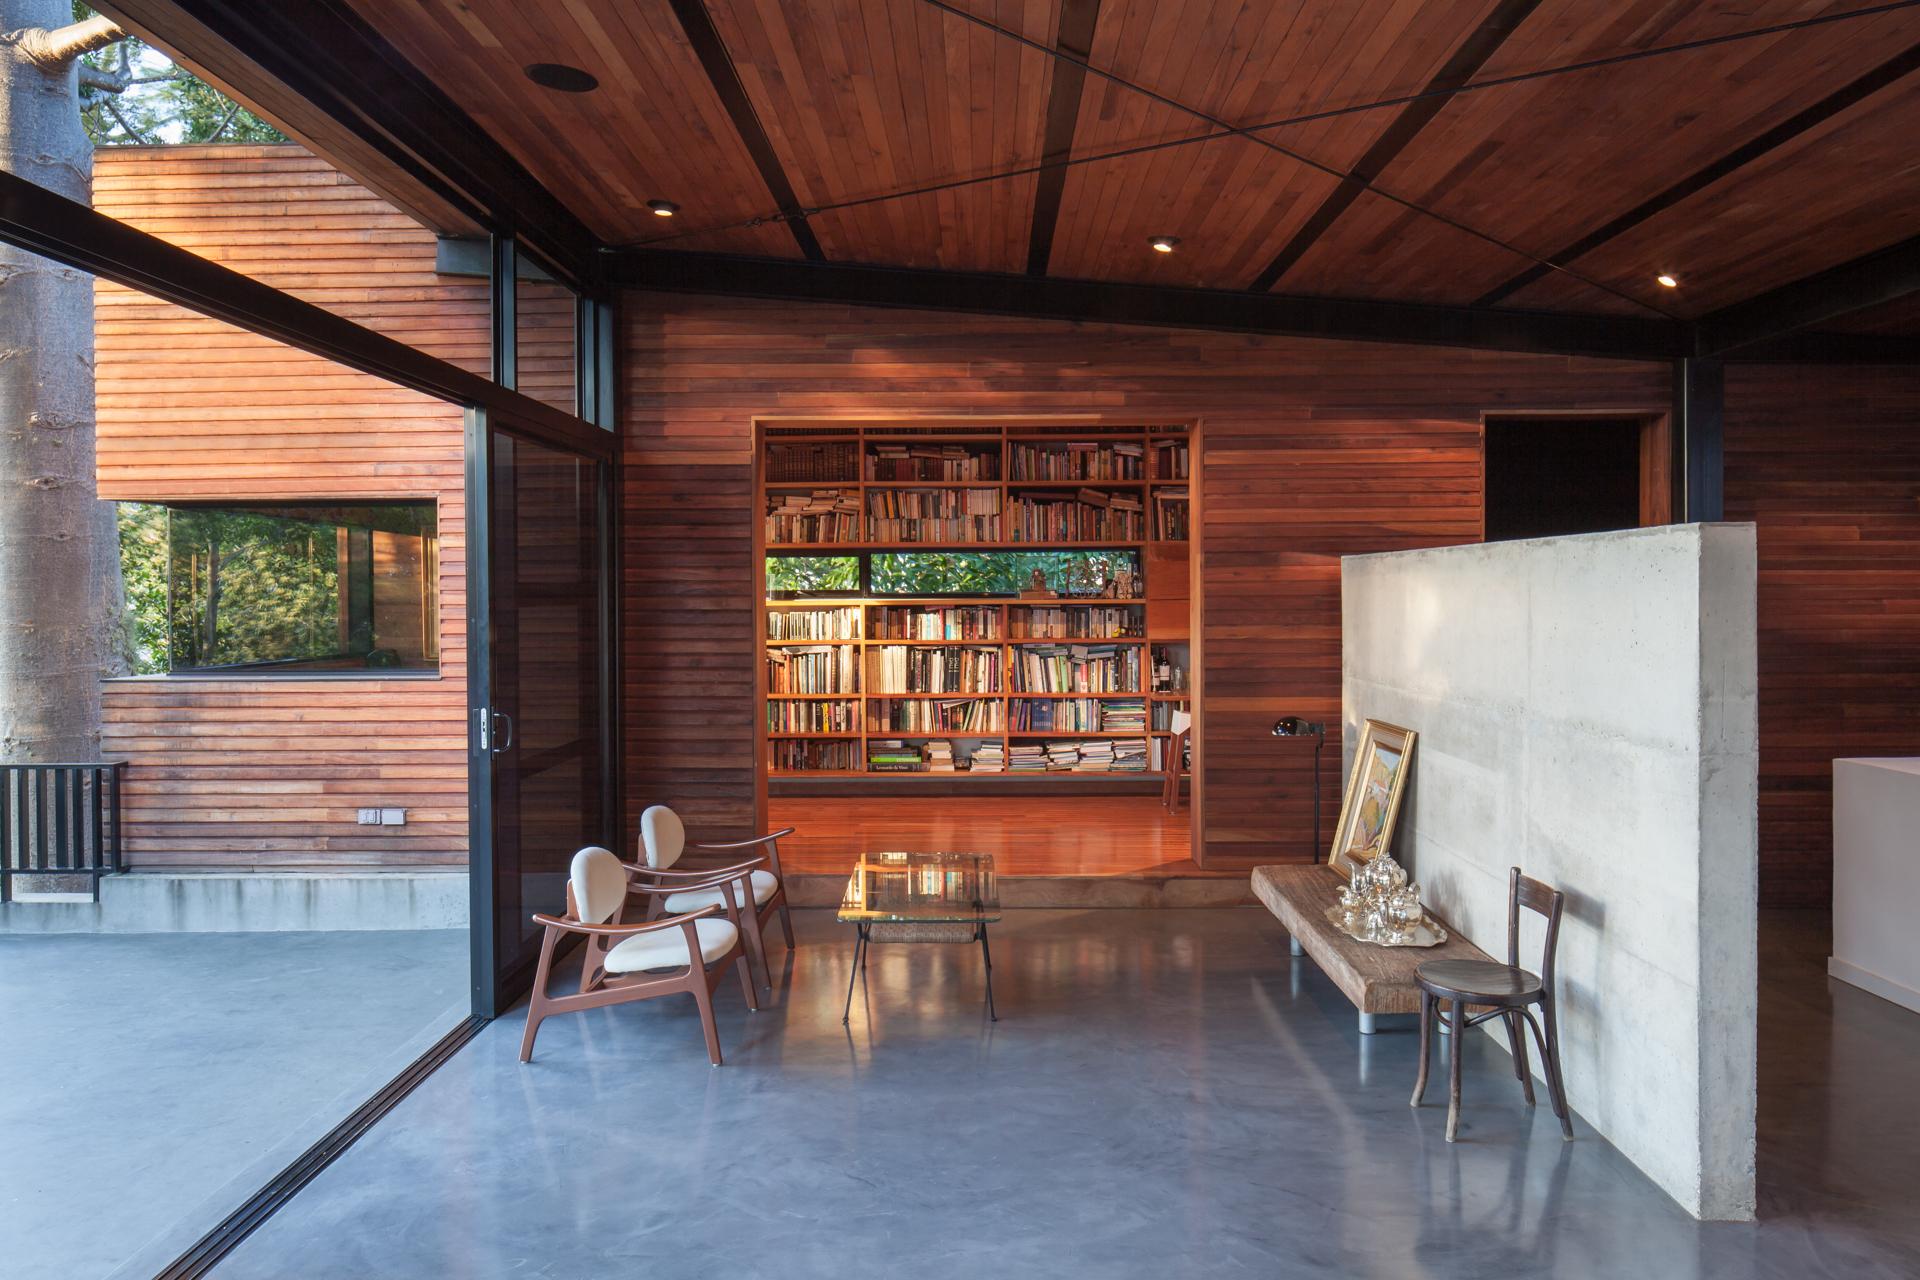 Architecture-Jason-Bax_1922_EDIT.JPG